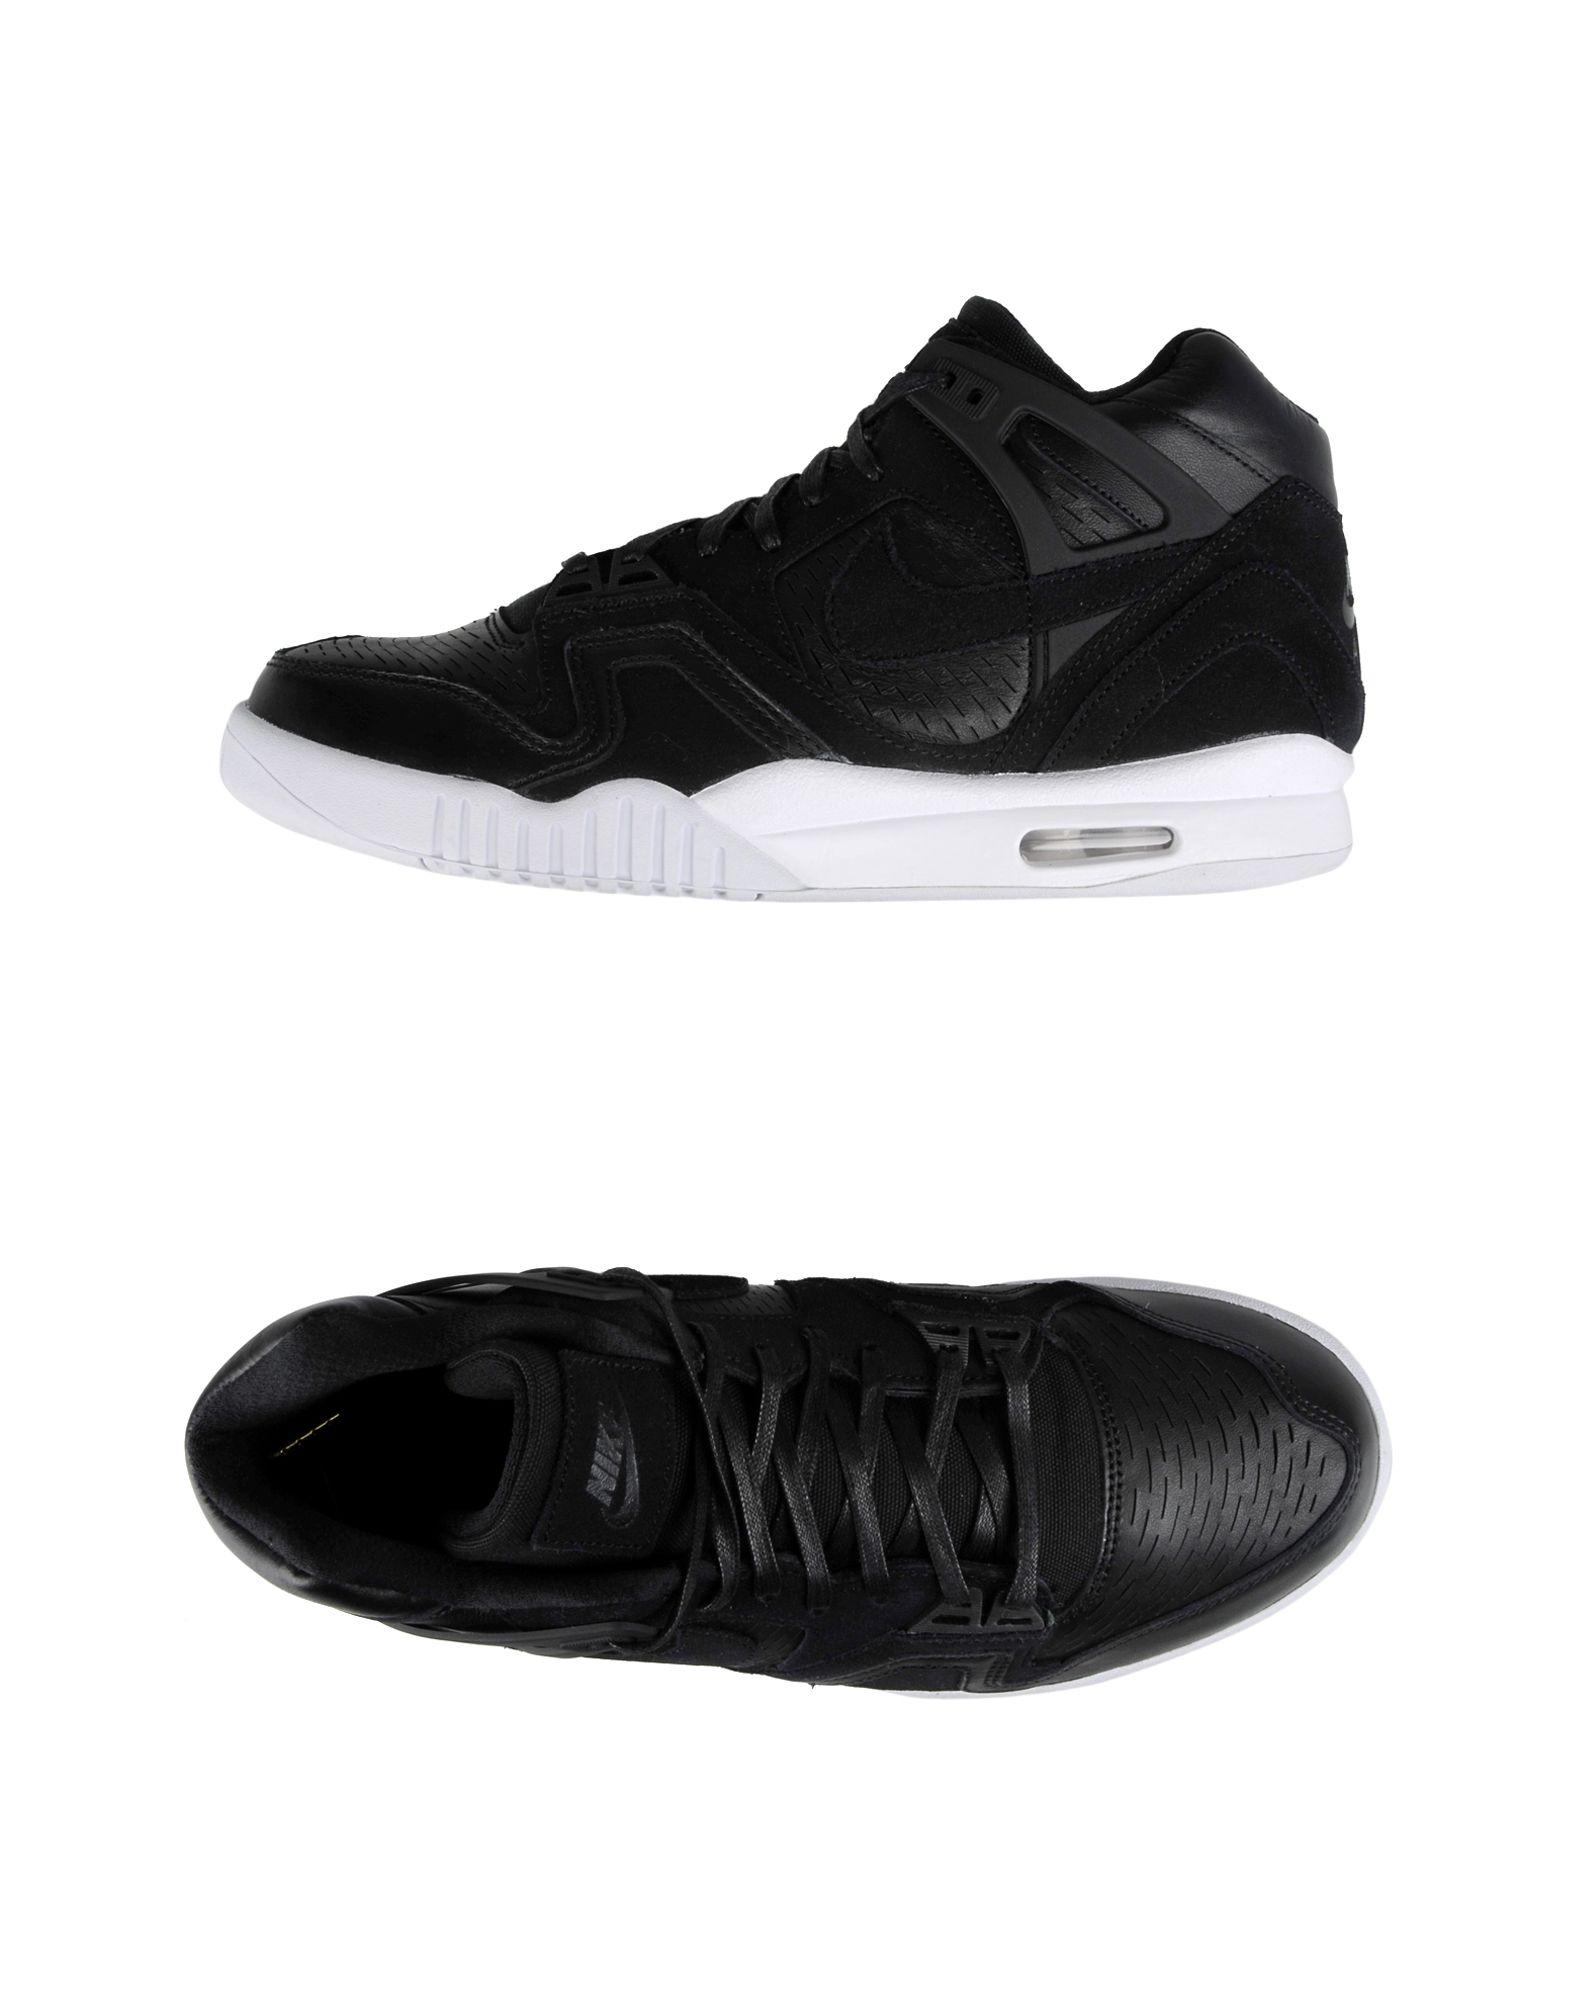 Sneakers Nike Air Tech Challenge Ii Laser - Uomo - 11043970UV